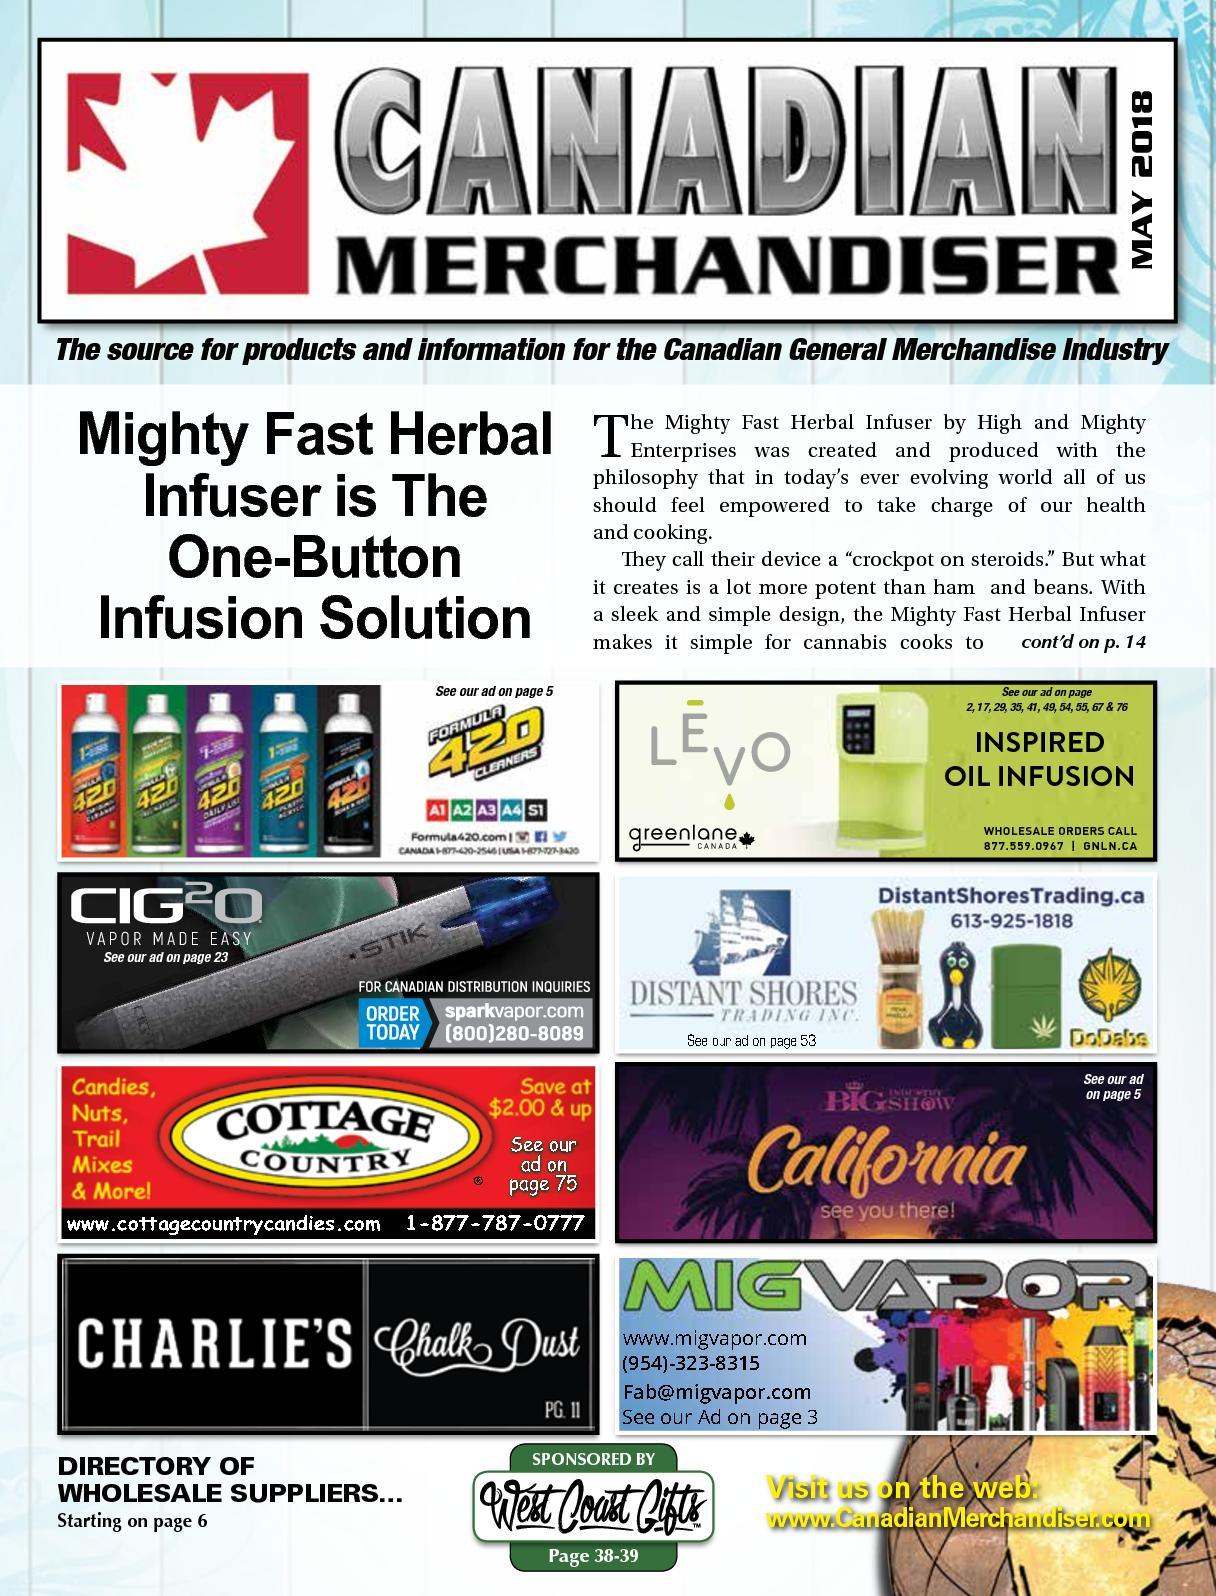 Calamo Canadian Merchandiser May2018 Ultrasonic Mist Fog Maker Power From Pc Supply Diy Guerilla Growing